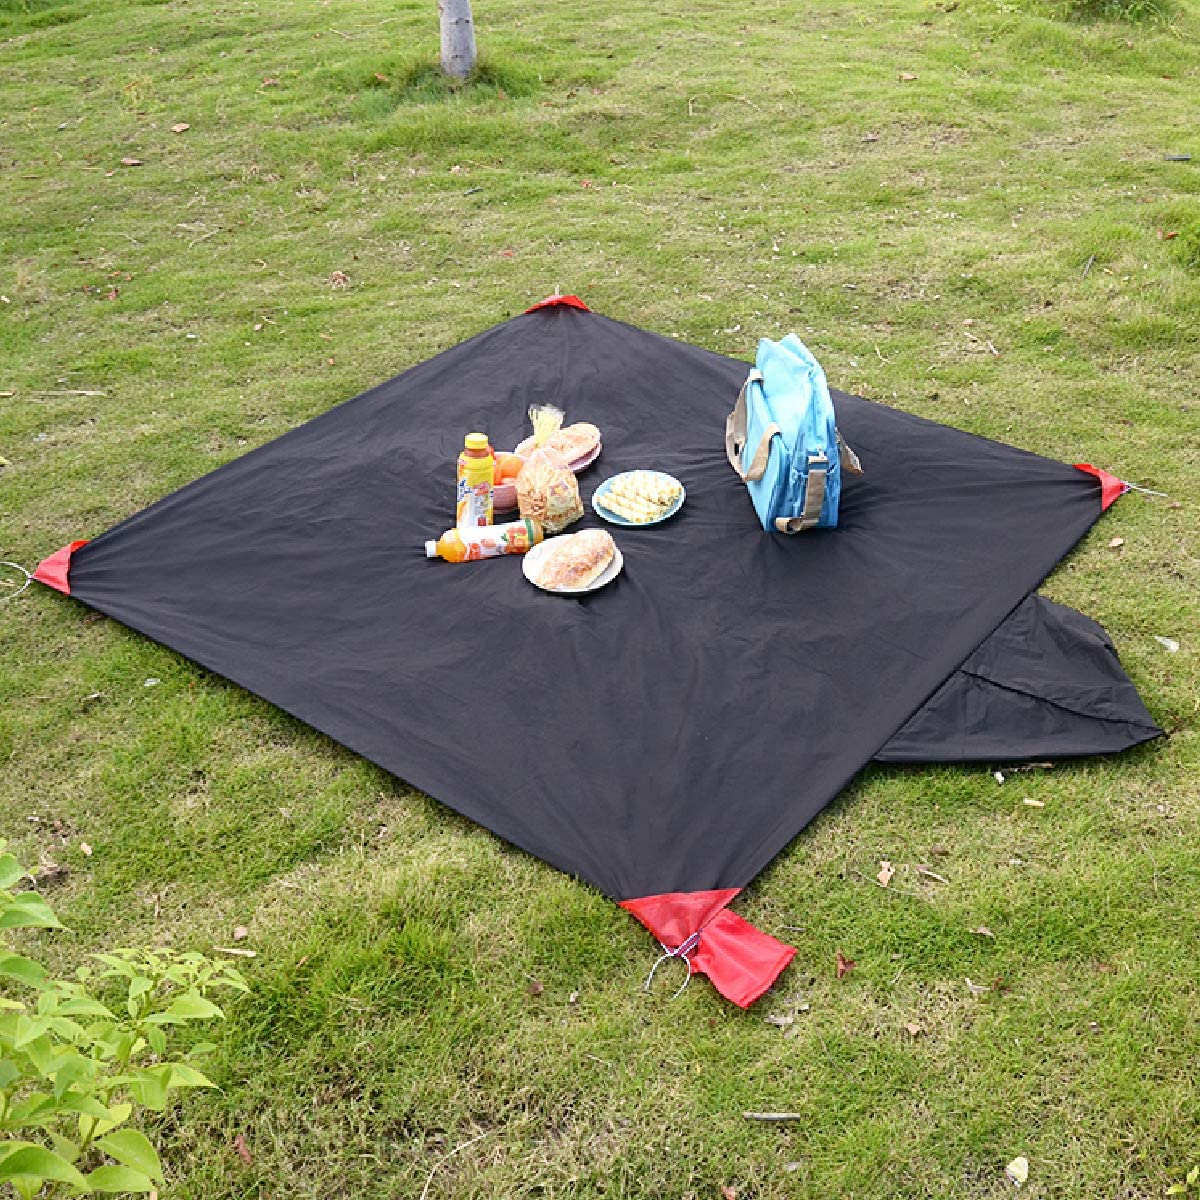 TRIWONDER Manta de Bolsillo Impermeable Plegable Lona Port/átil para Picnic Playa Camping Viaje Senderismo al Aire Libre